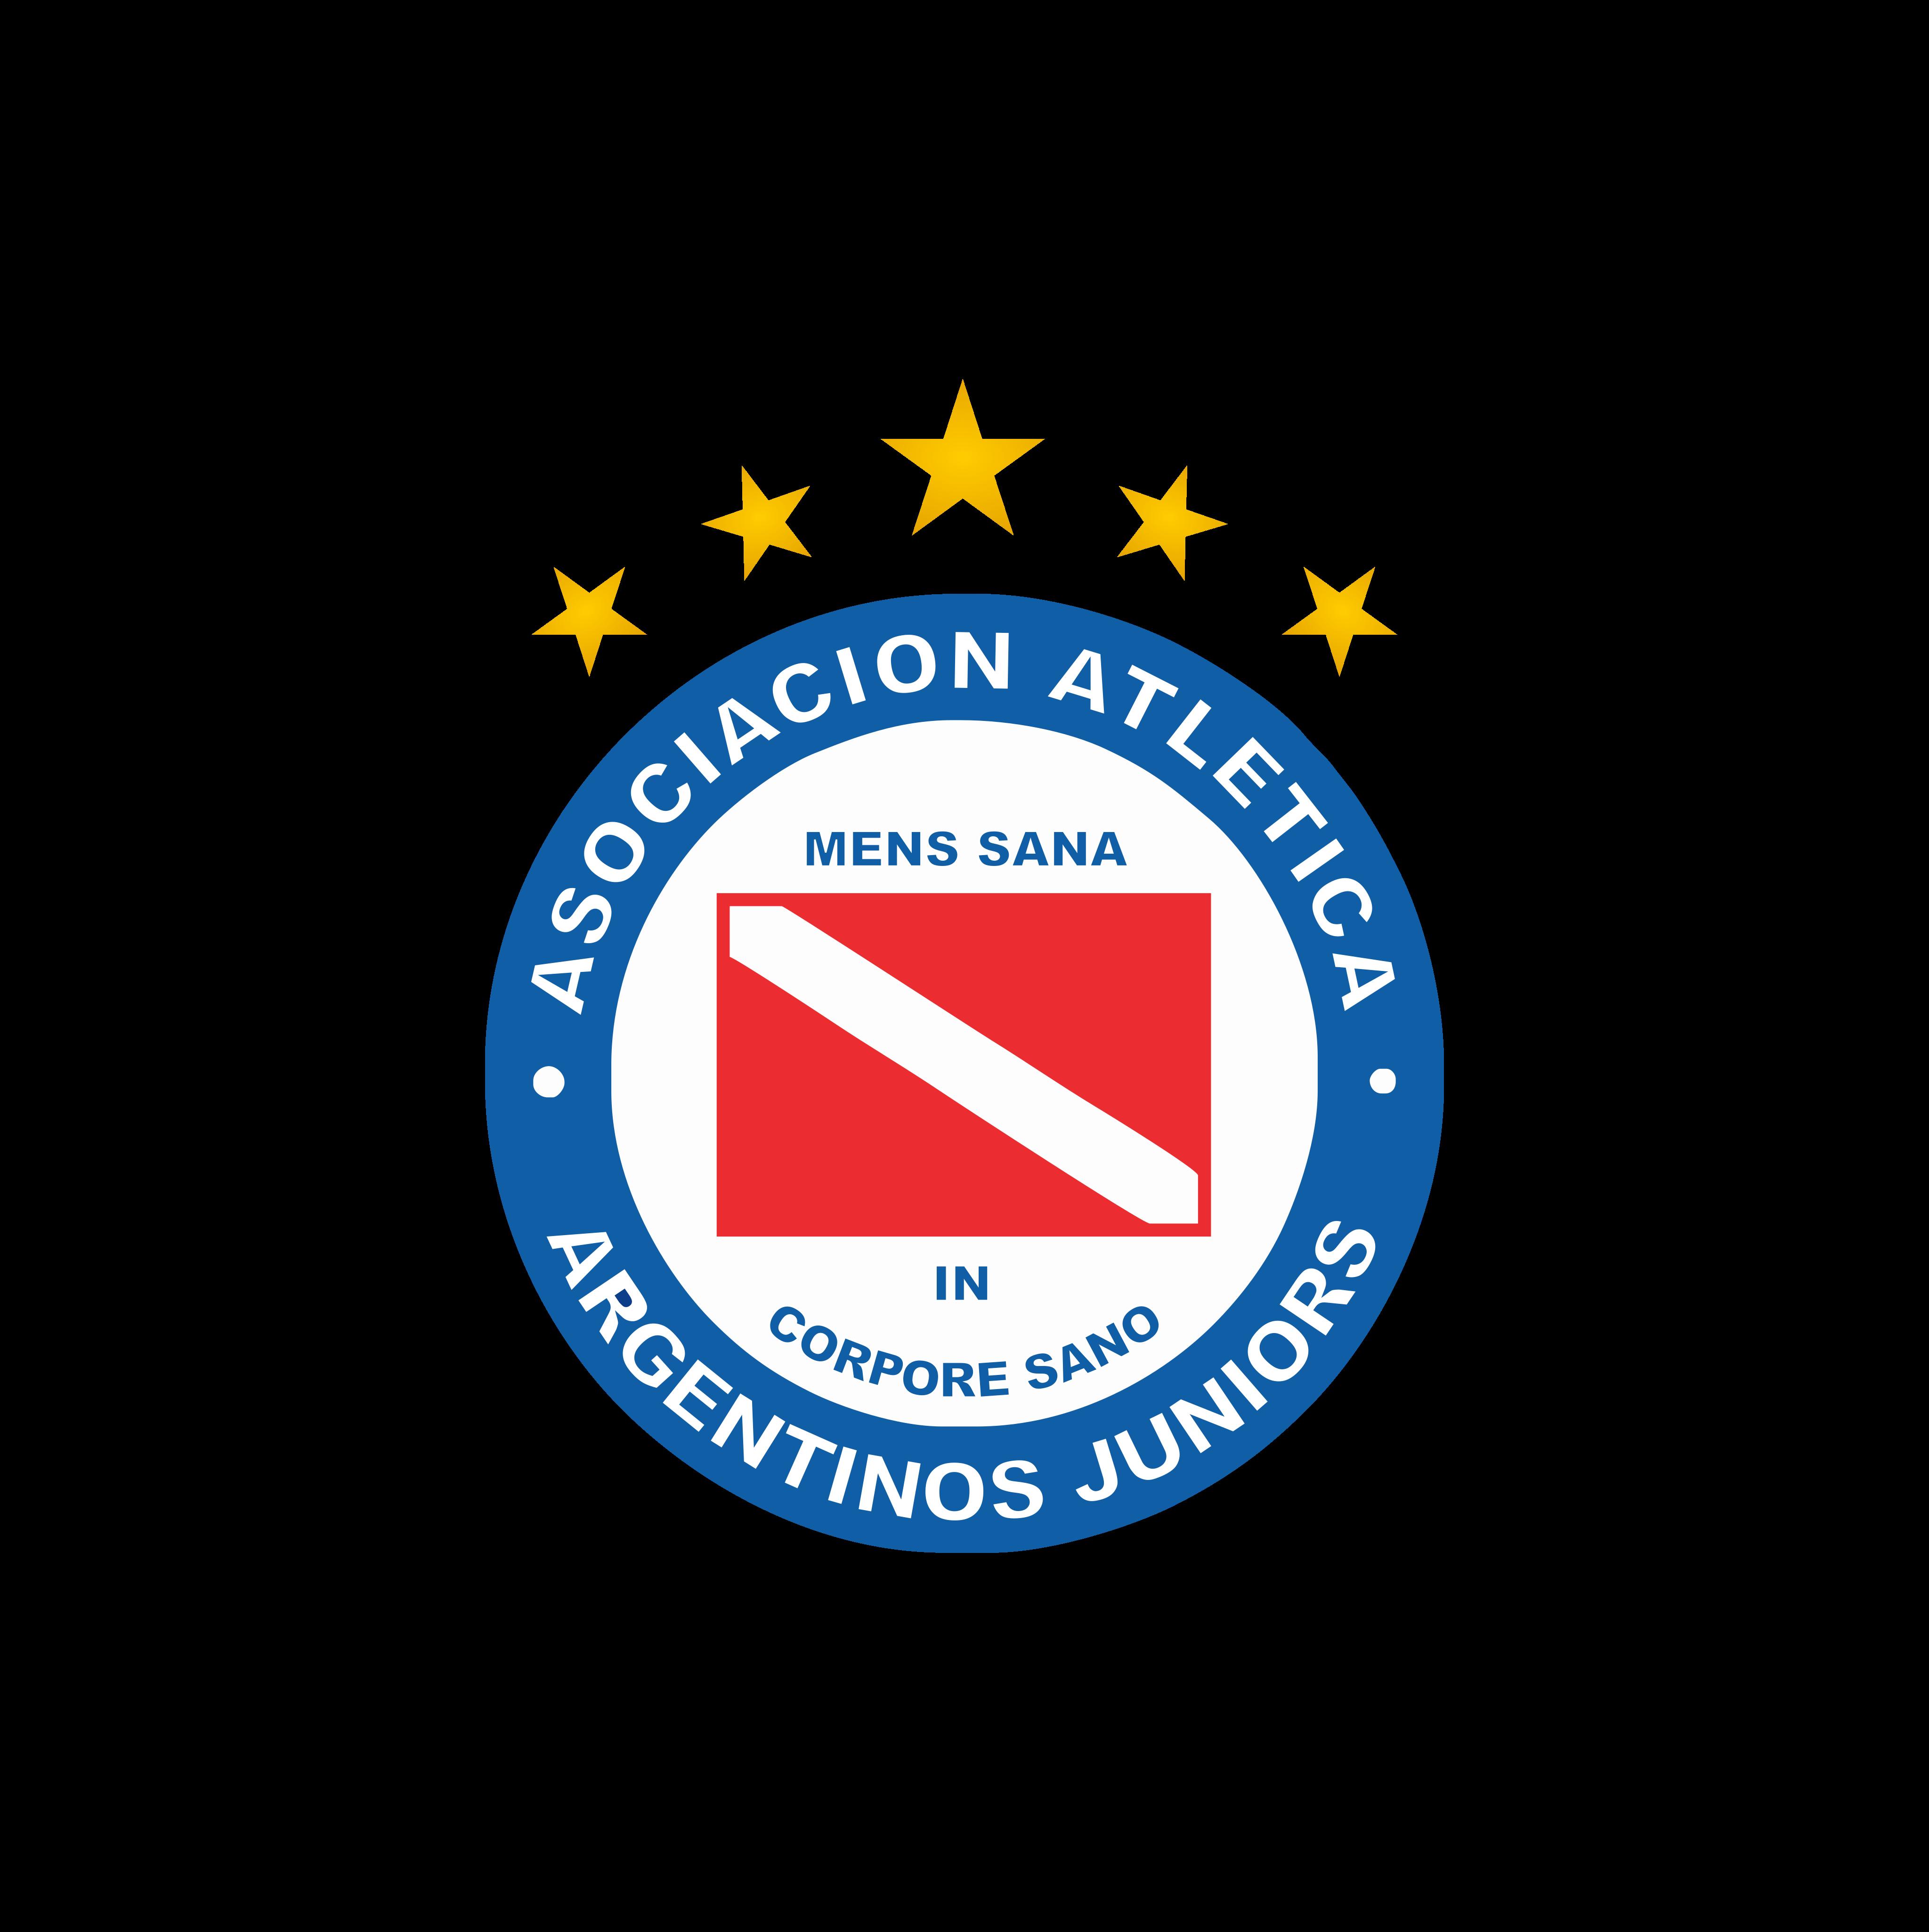 argentinos juniors logo 0 - Argentinos Juniors Logo